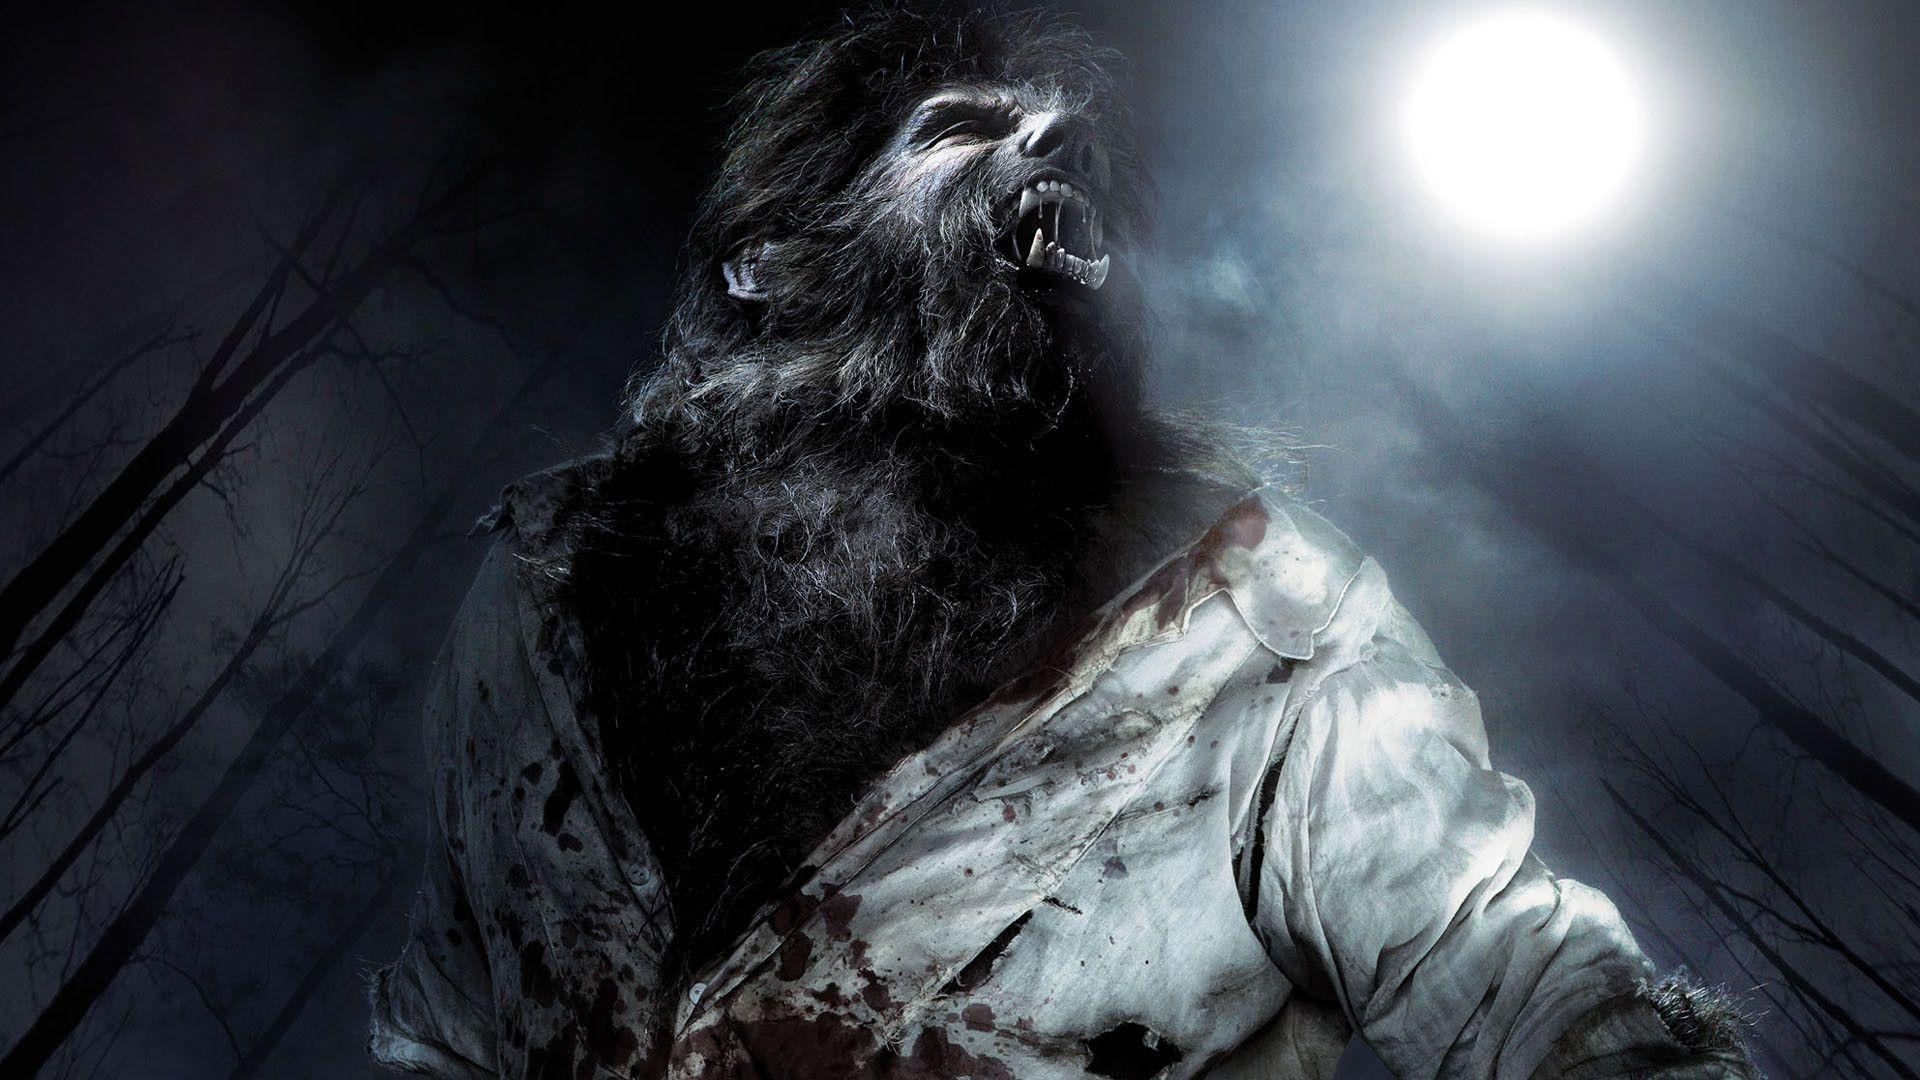 Underworld Werewolf Wallpapers - Wallpaper Cave